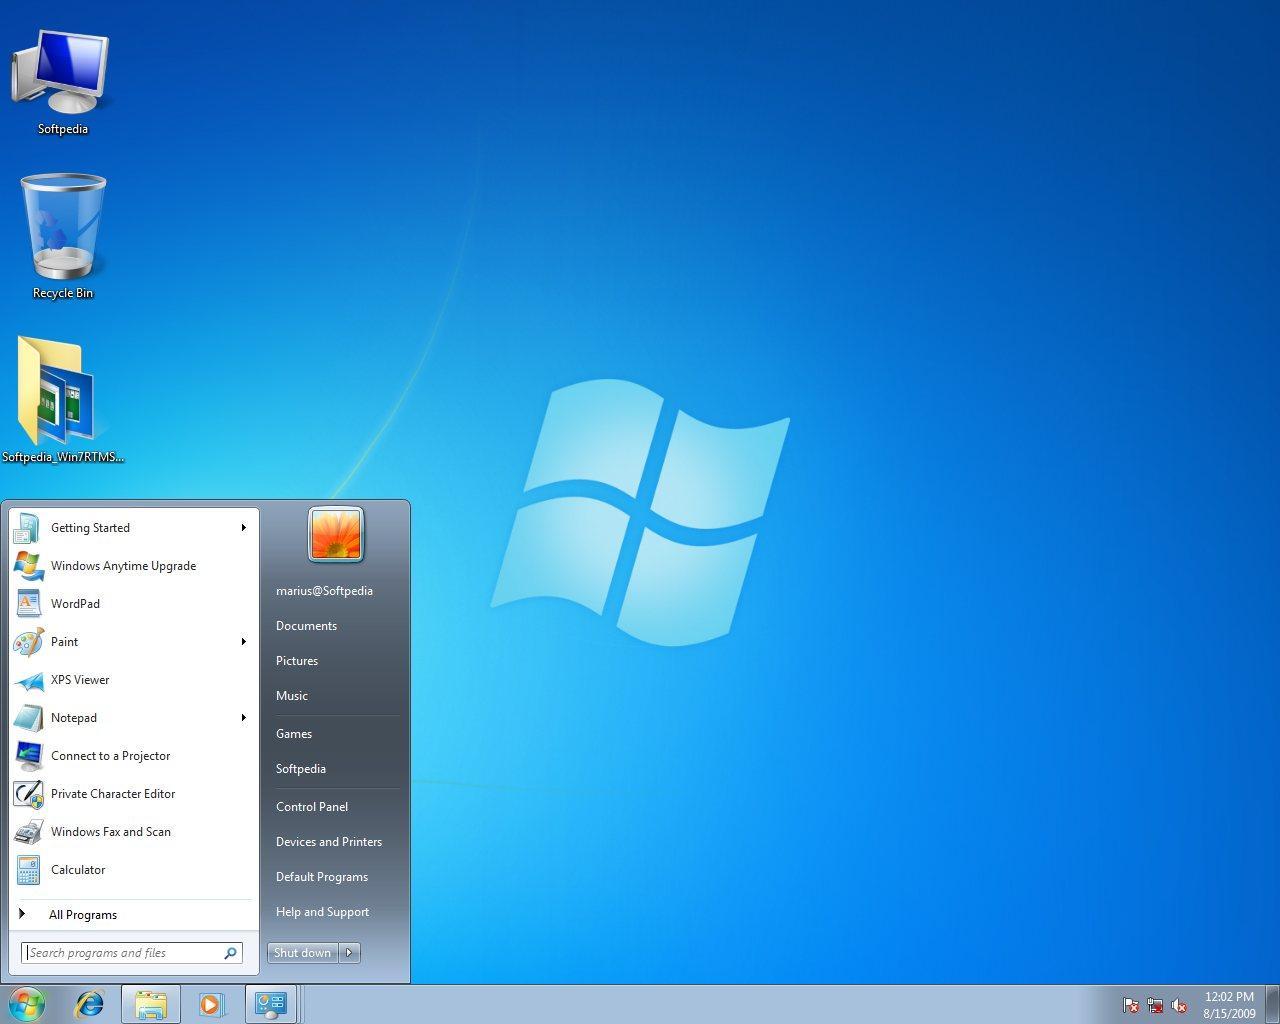 windows7怎么安装_windows 7 starter完整安装及桌面截图